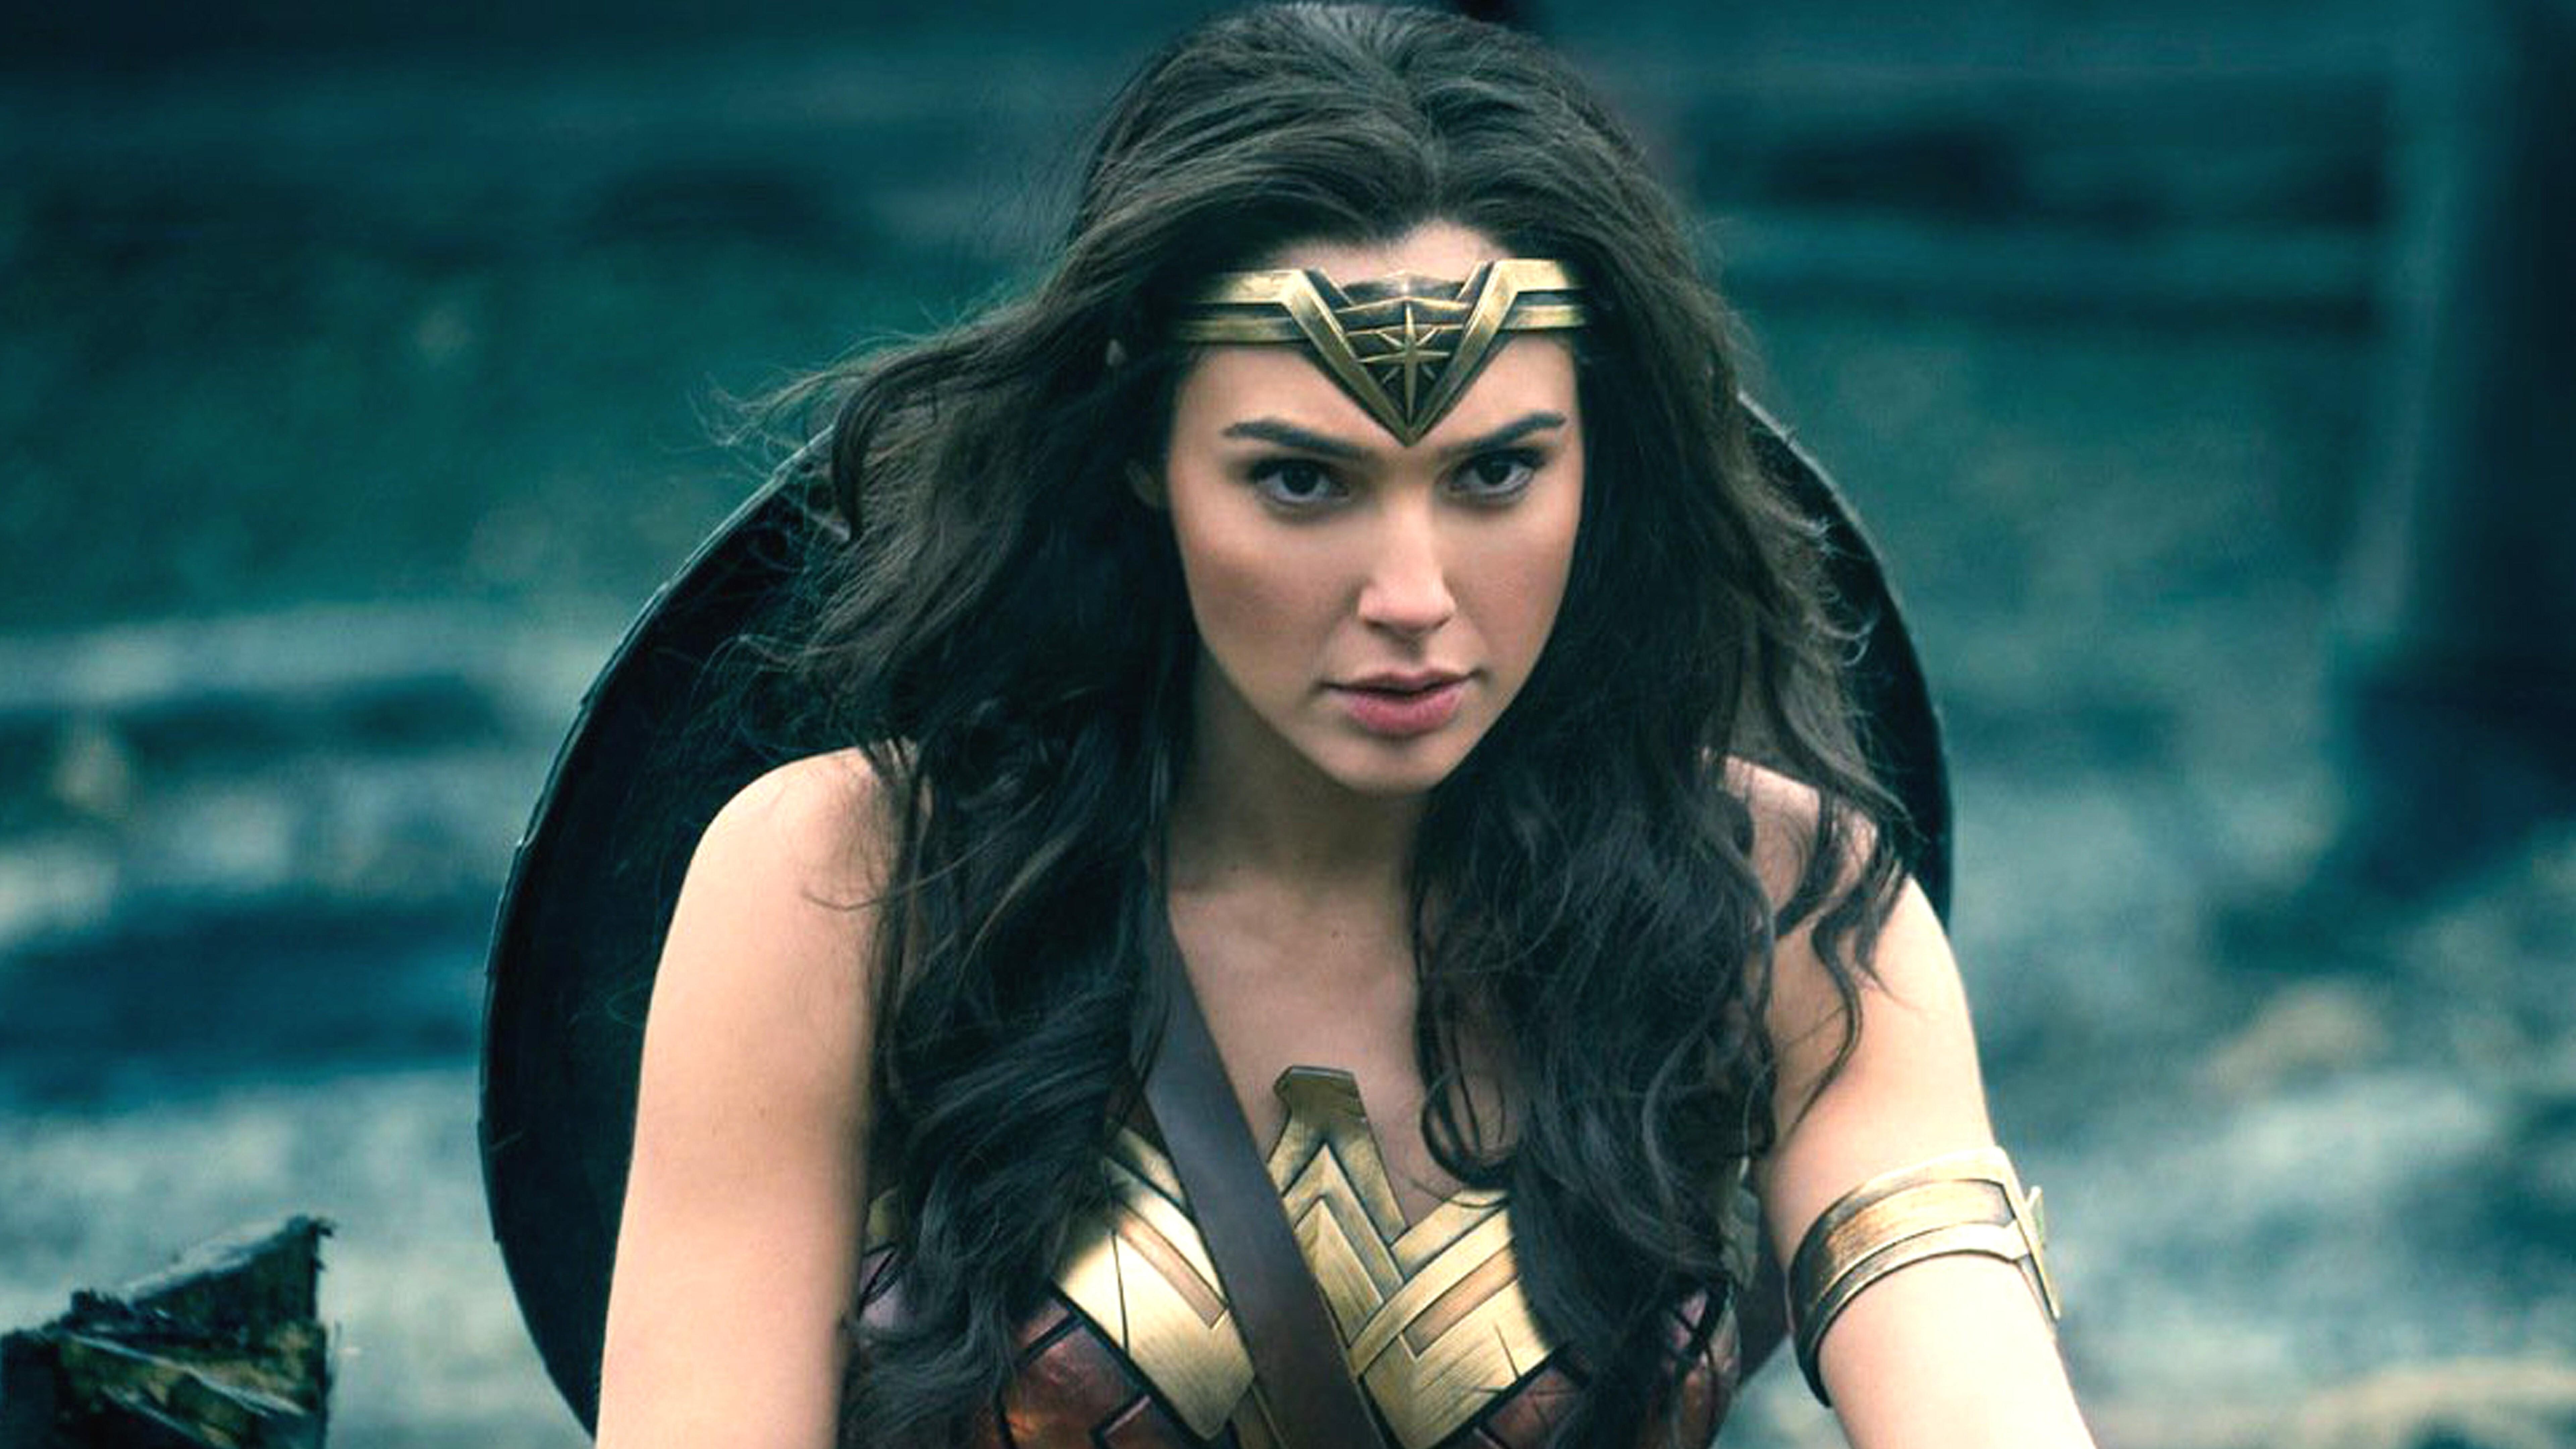 8k Pic Of Wonder Woman Hd Wallpapers